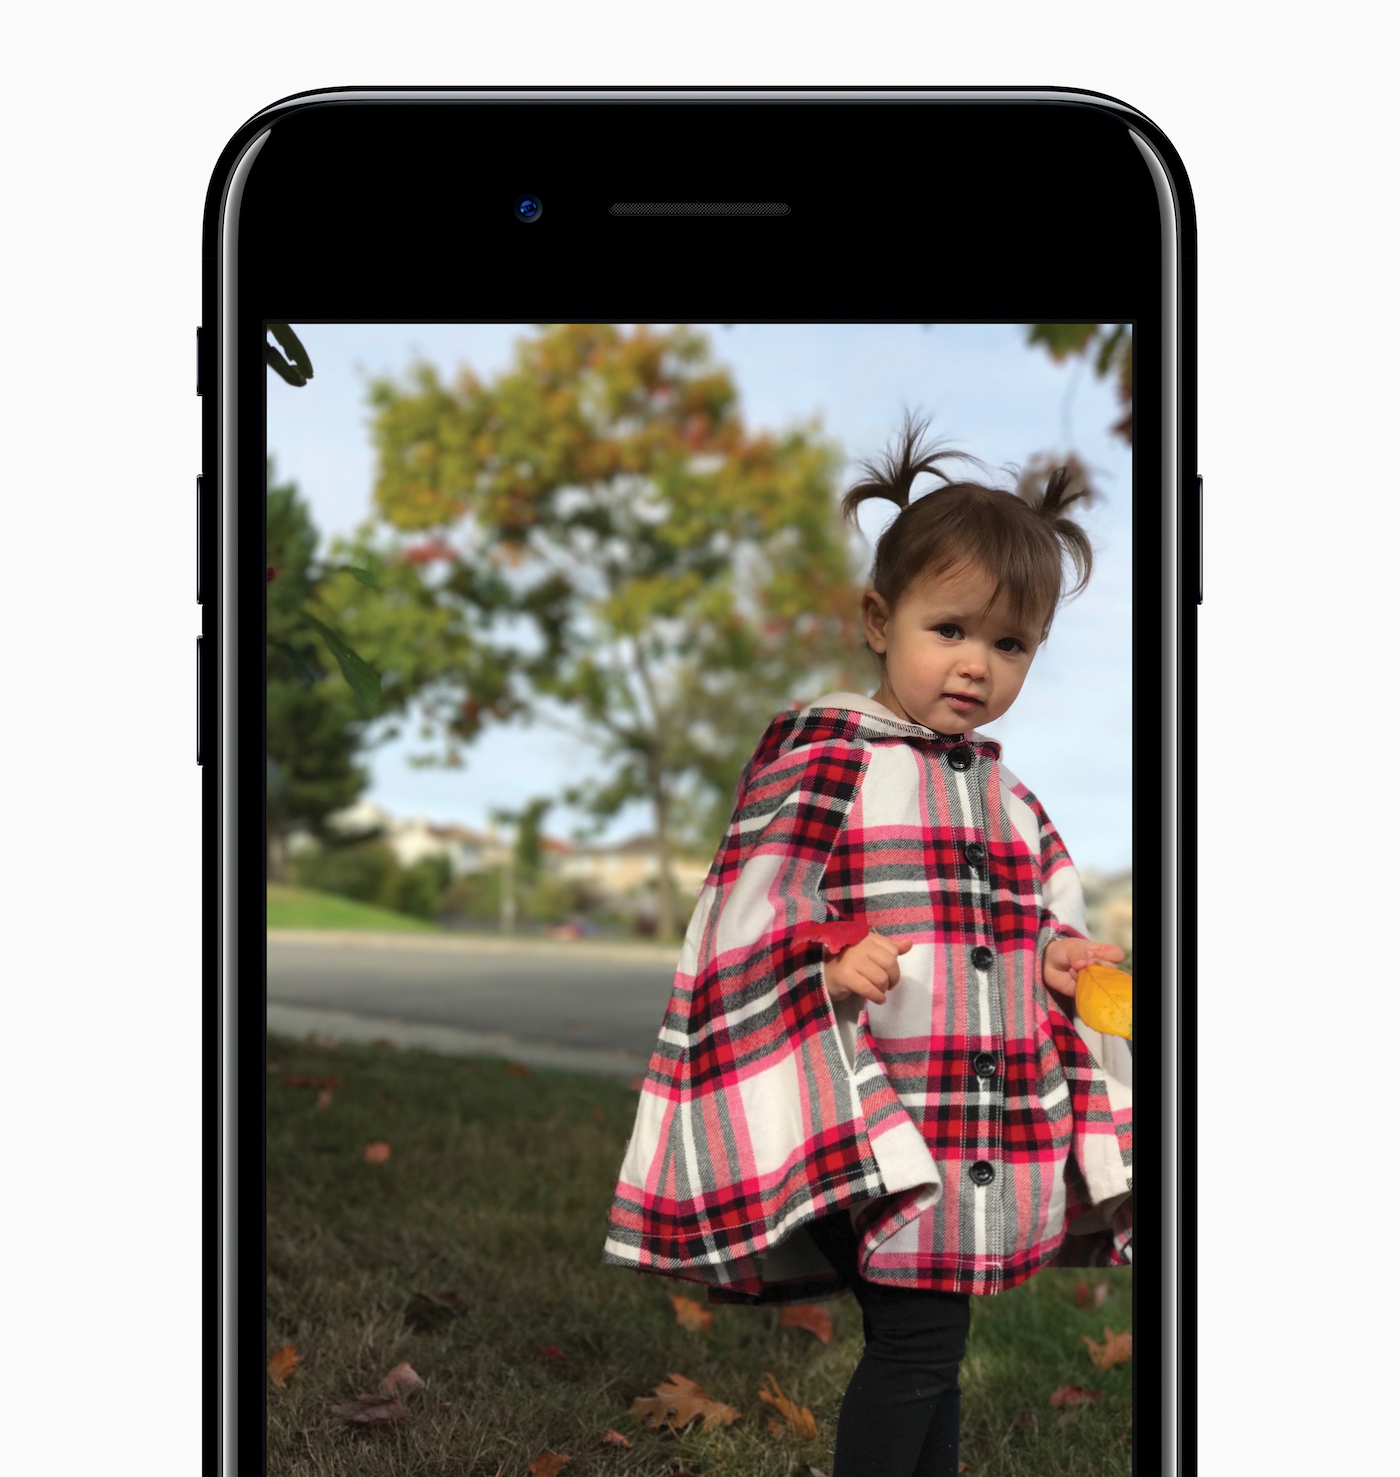 iPhone 7 Plus: So gelingen gute Porträtfotos mit Tiefenschärfe-Effekt.